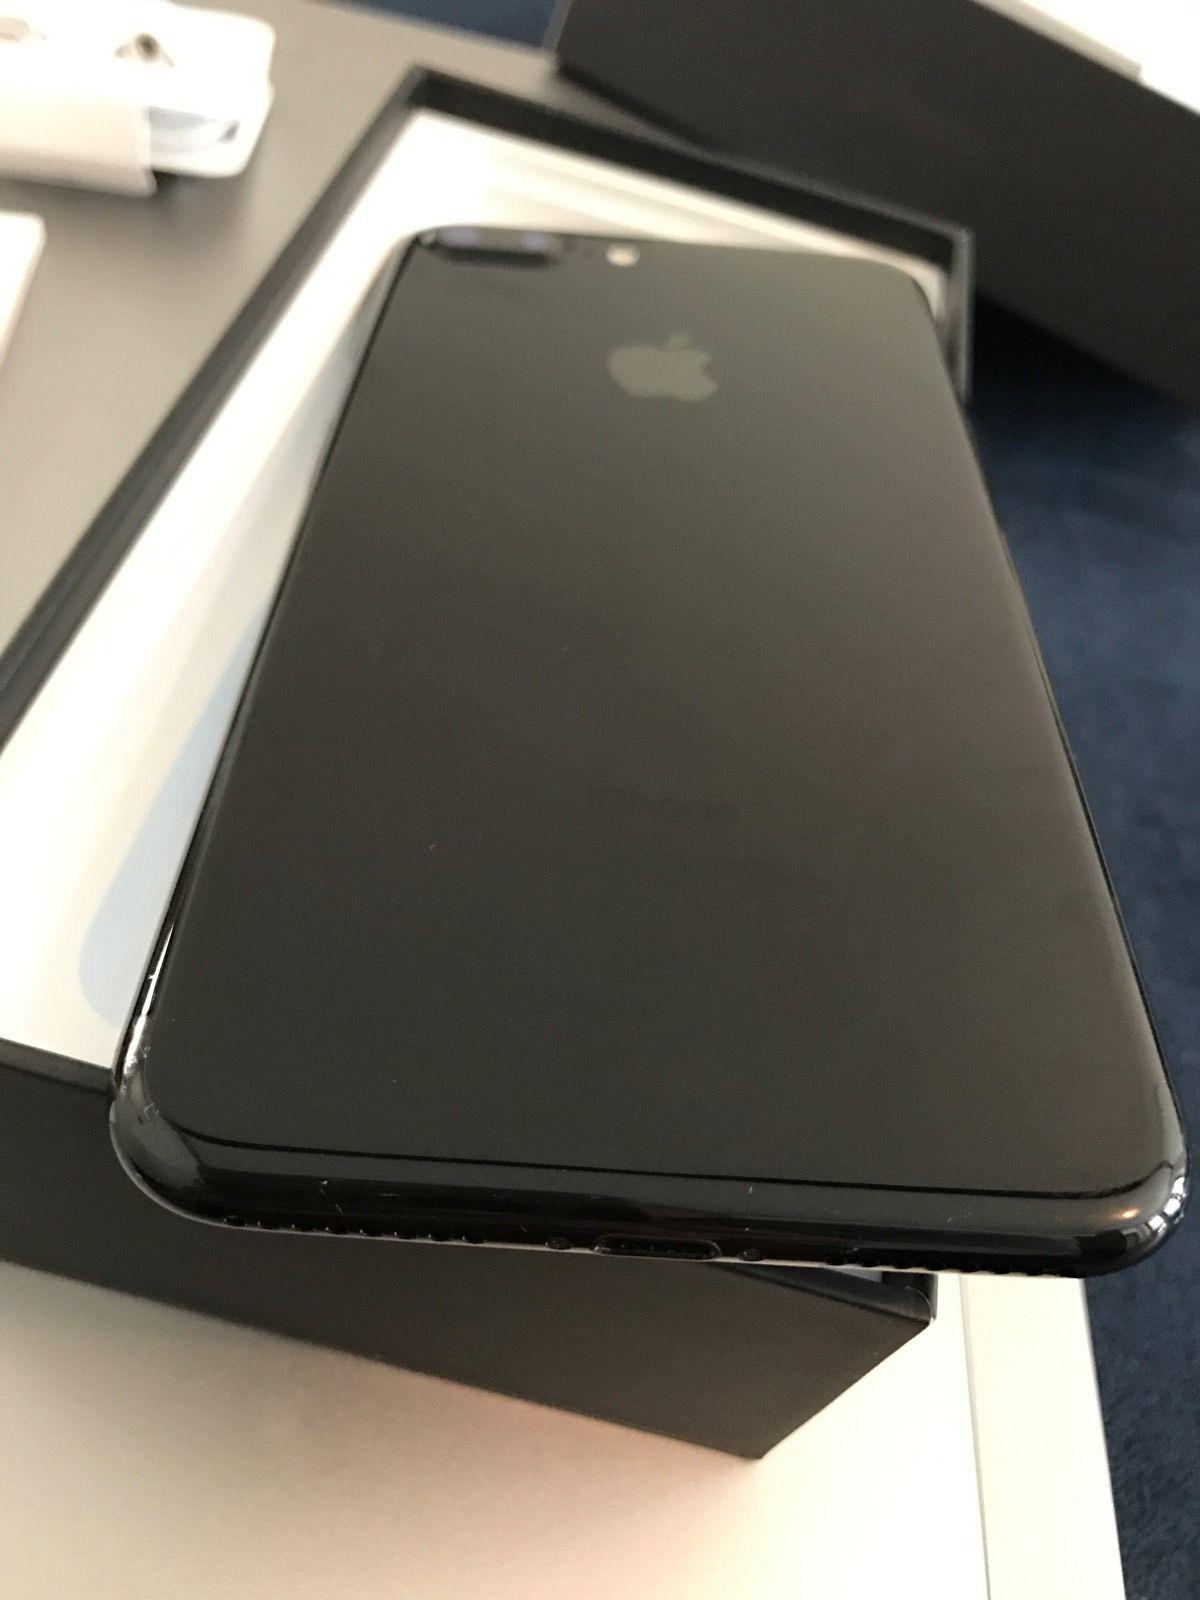 Apple iPhone 7 Plus Latest Model 256GB jet black